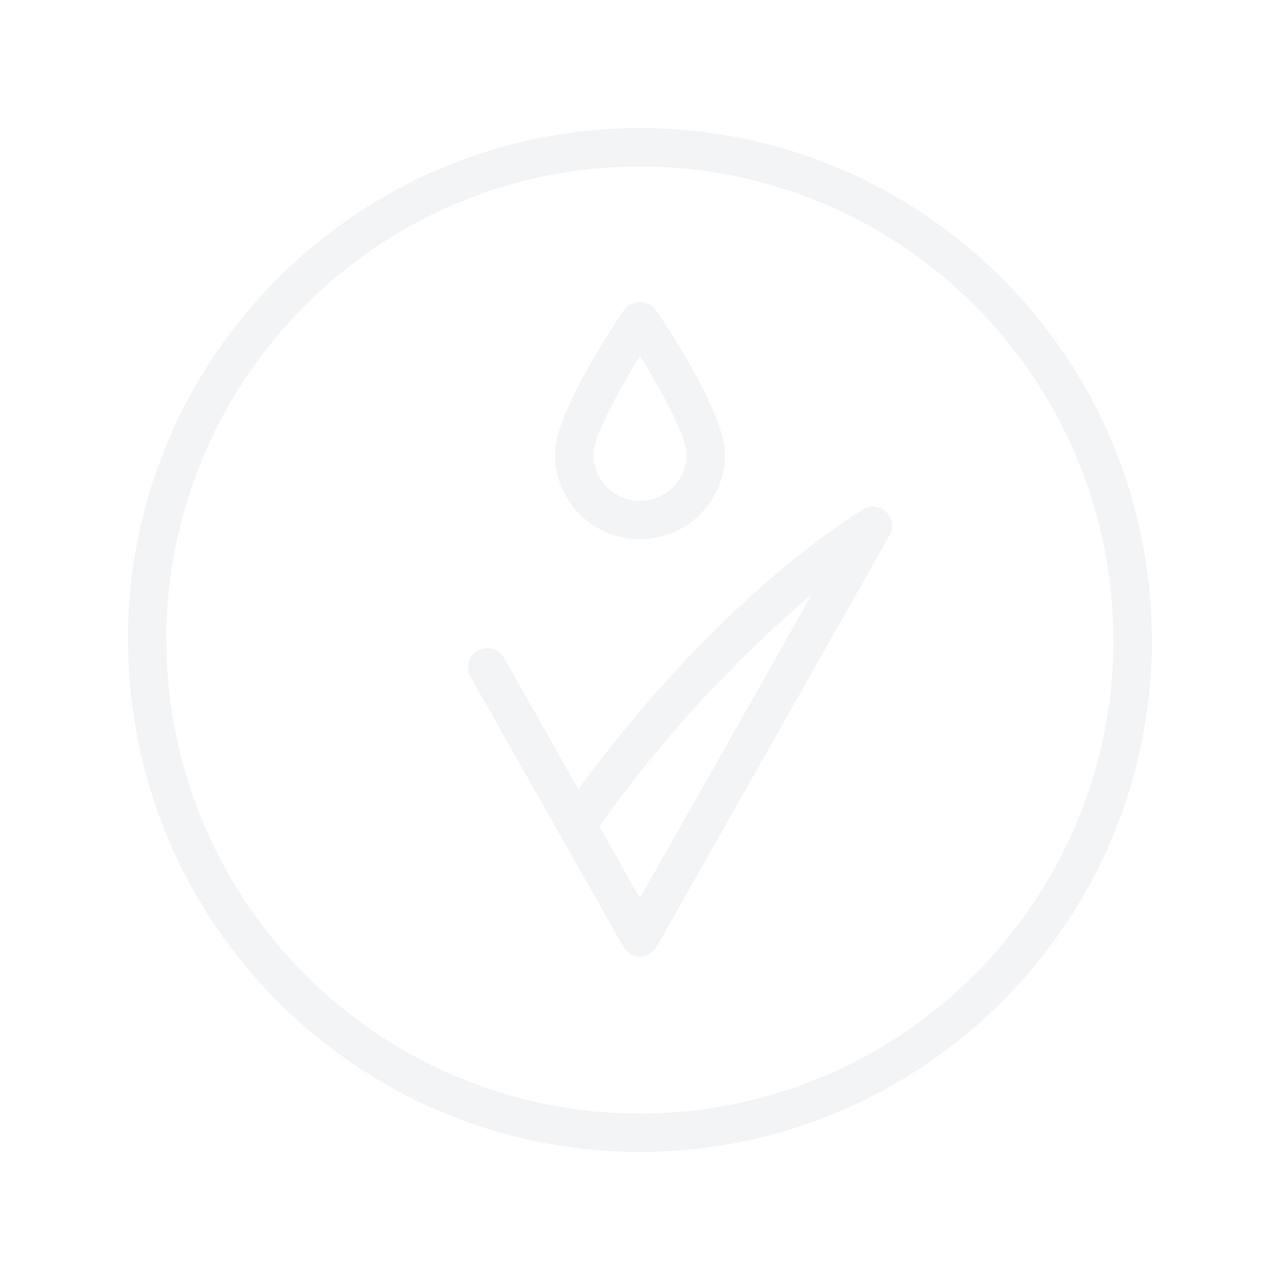 TINTS OF NATURE Henna Cream Black 70ml